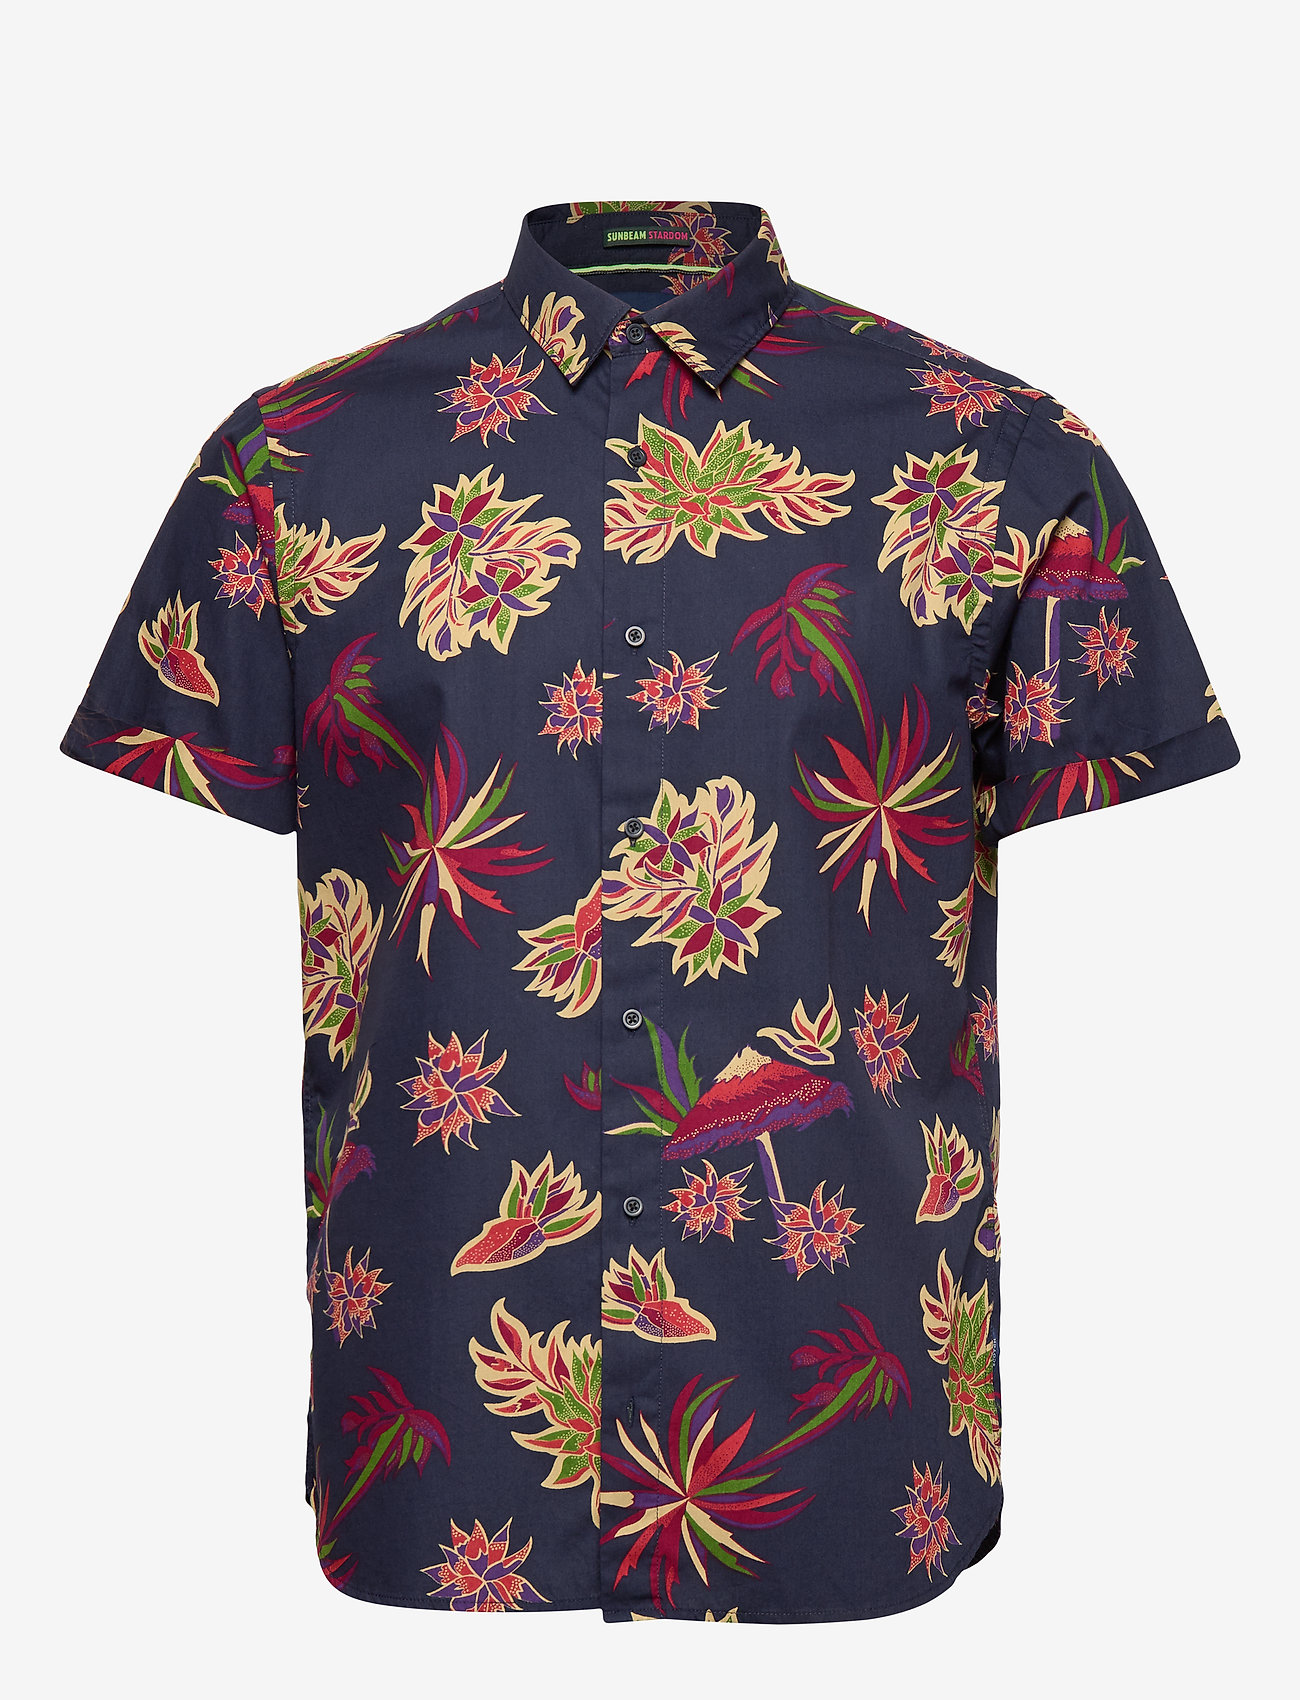 Scotch & Soda - REGULAR FIT- All-over printed shortsleeve shirt - short-sleeved shirts - combo h - 0